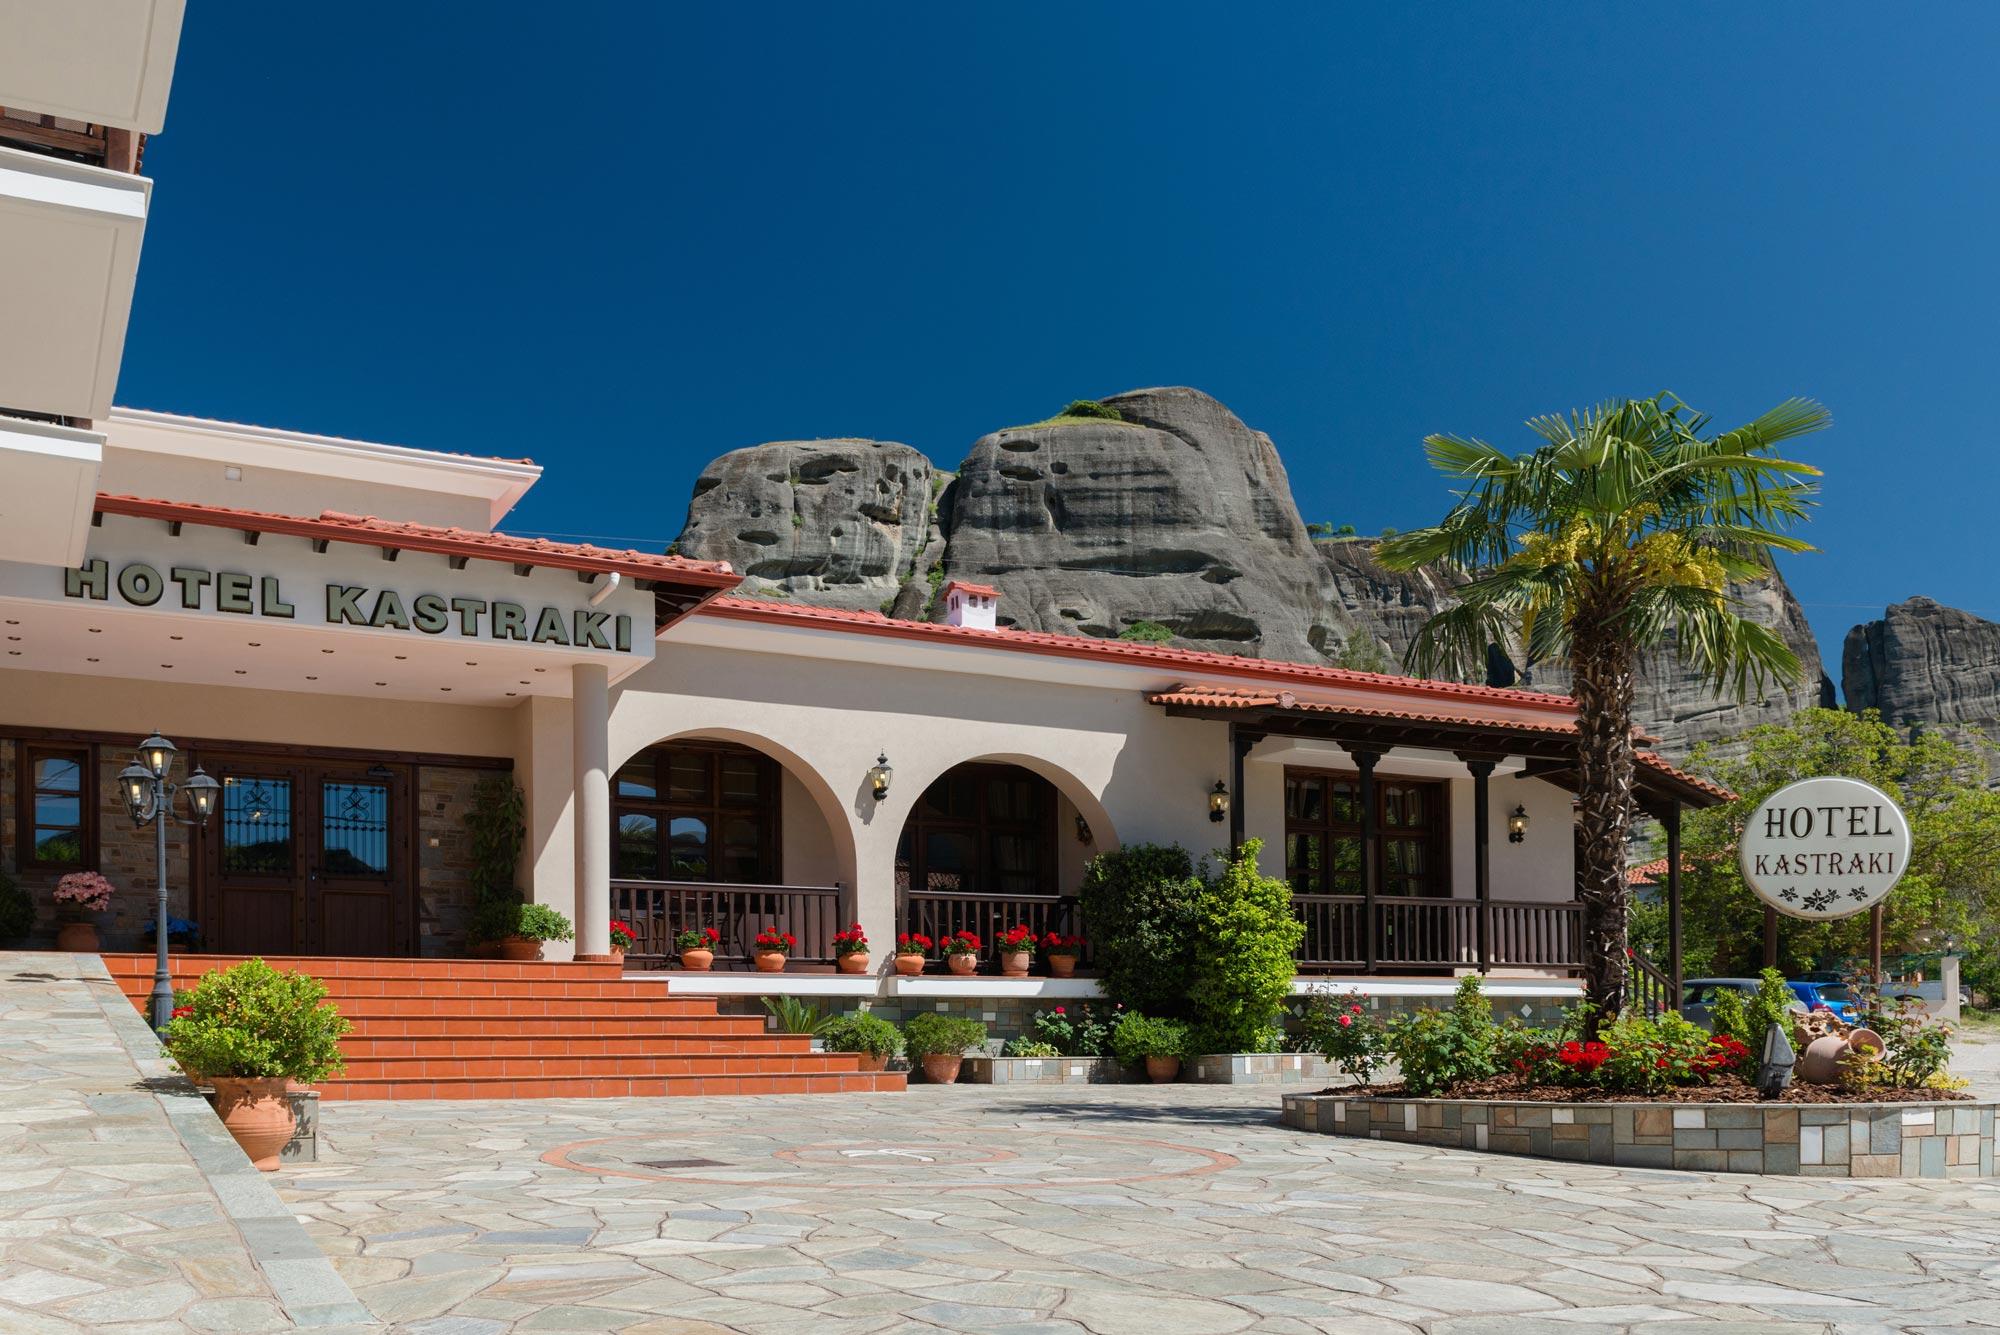 Hotel Kastraki  Ξενοδοχείο Καστράκι Μετέωρα Καλμπάκας